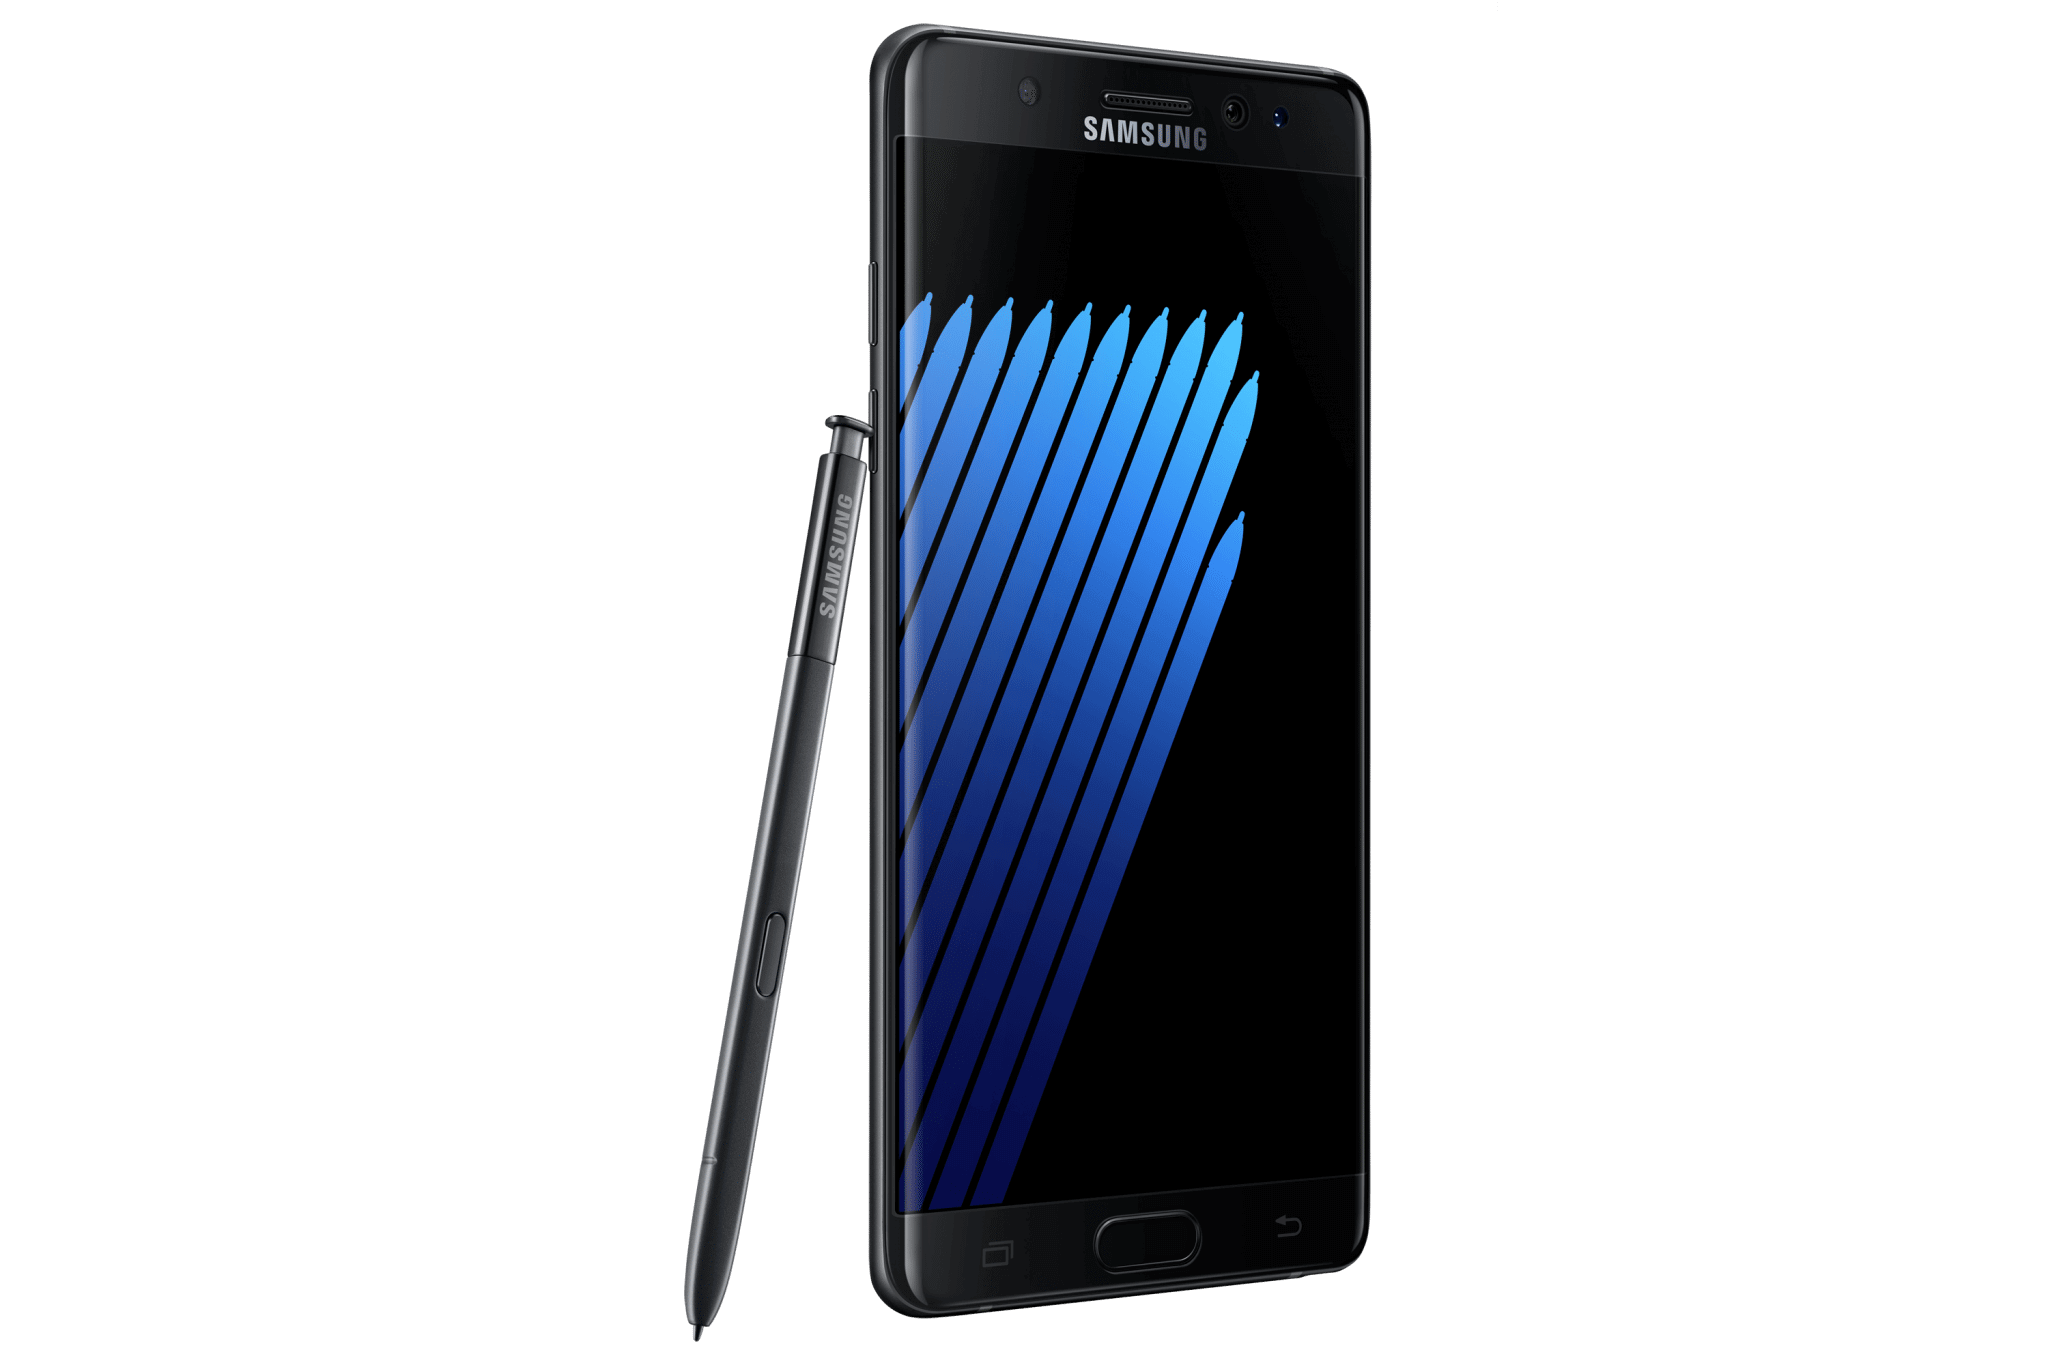 Samsung promete Android Nougat para Galaxy Note7 em três meses